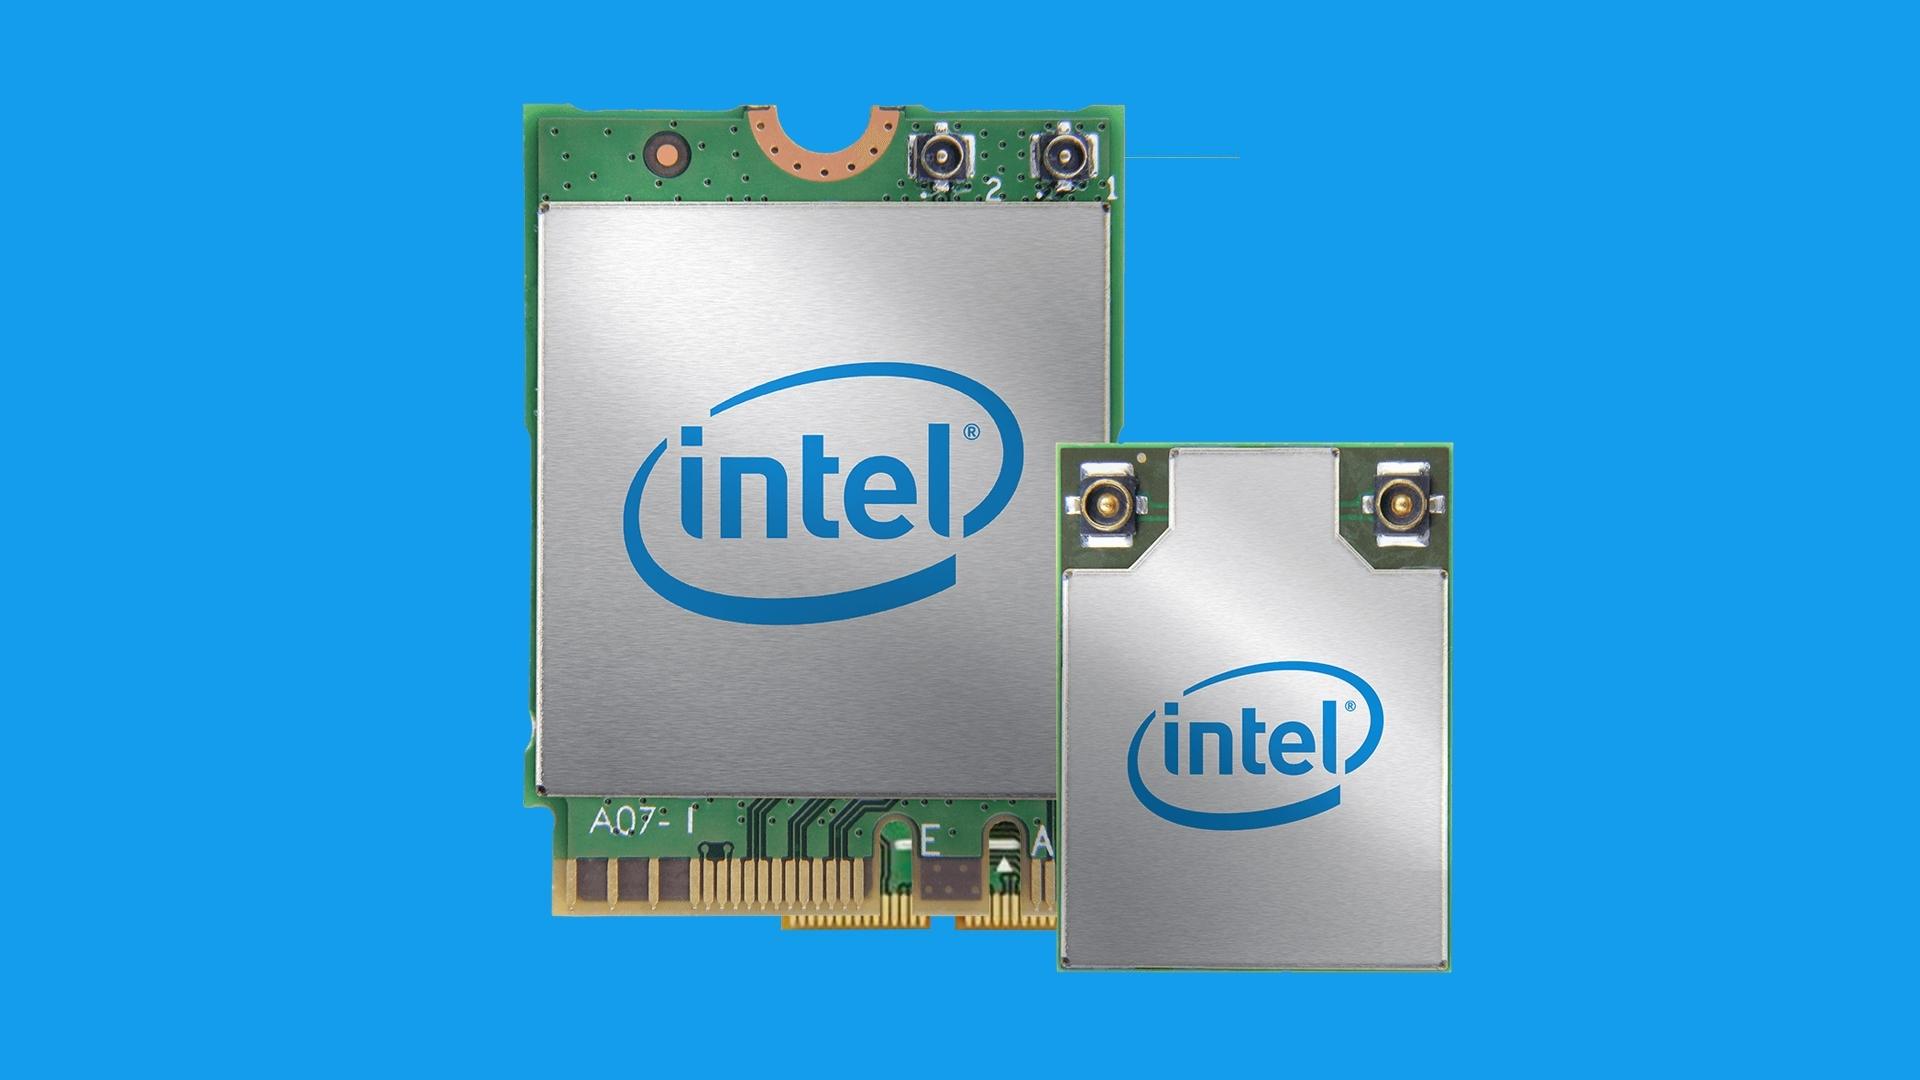 Intel首款Wi-Fi 6无线网卡发布:峰值速率2.4Gbps